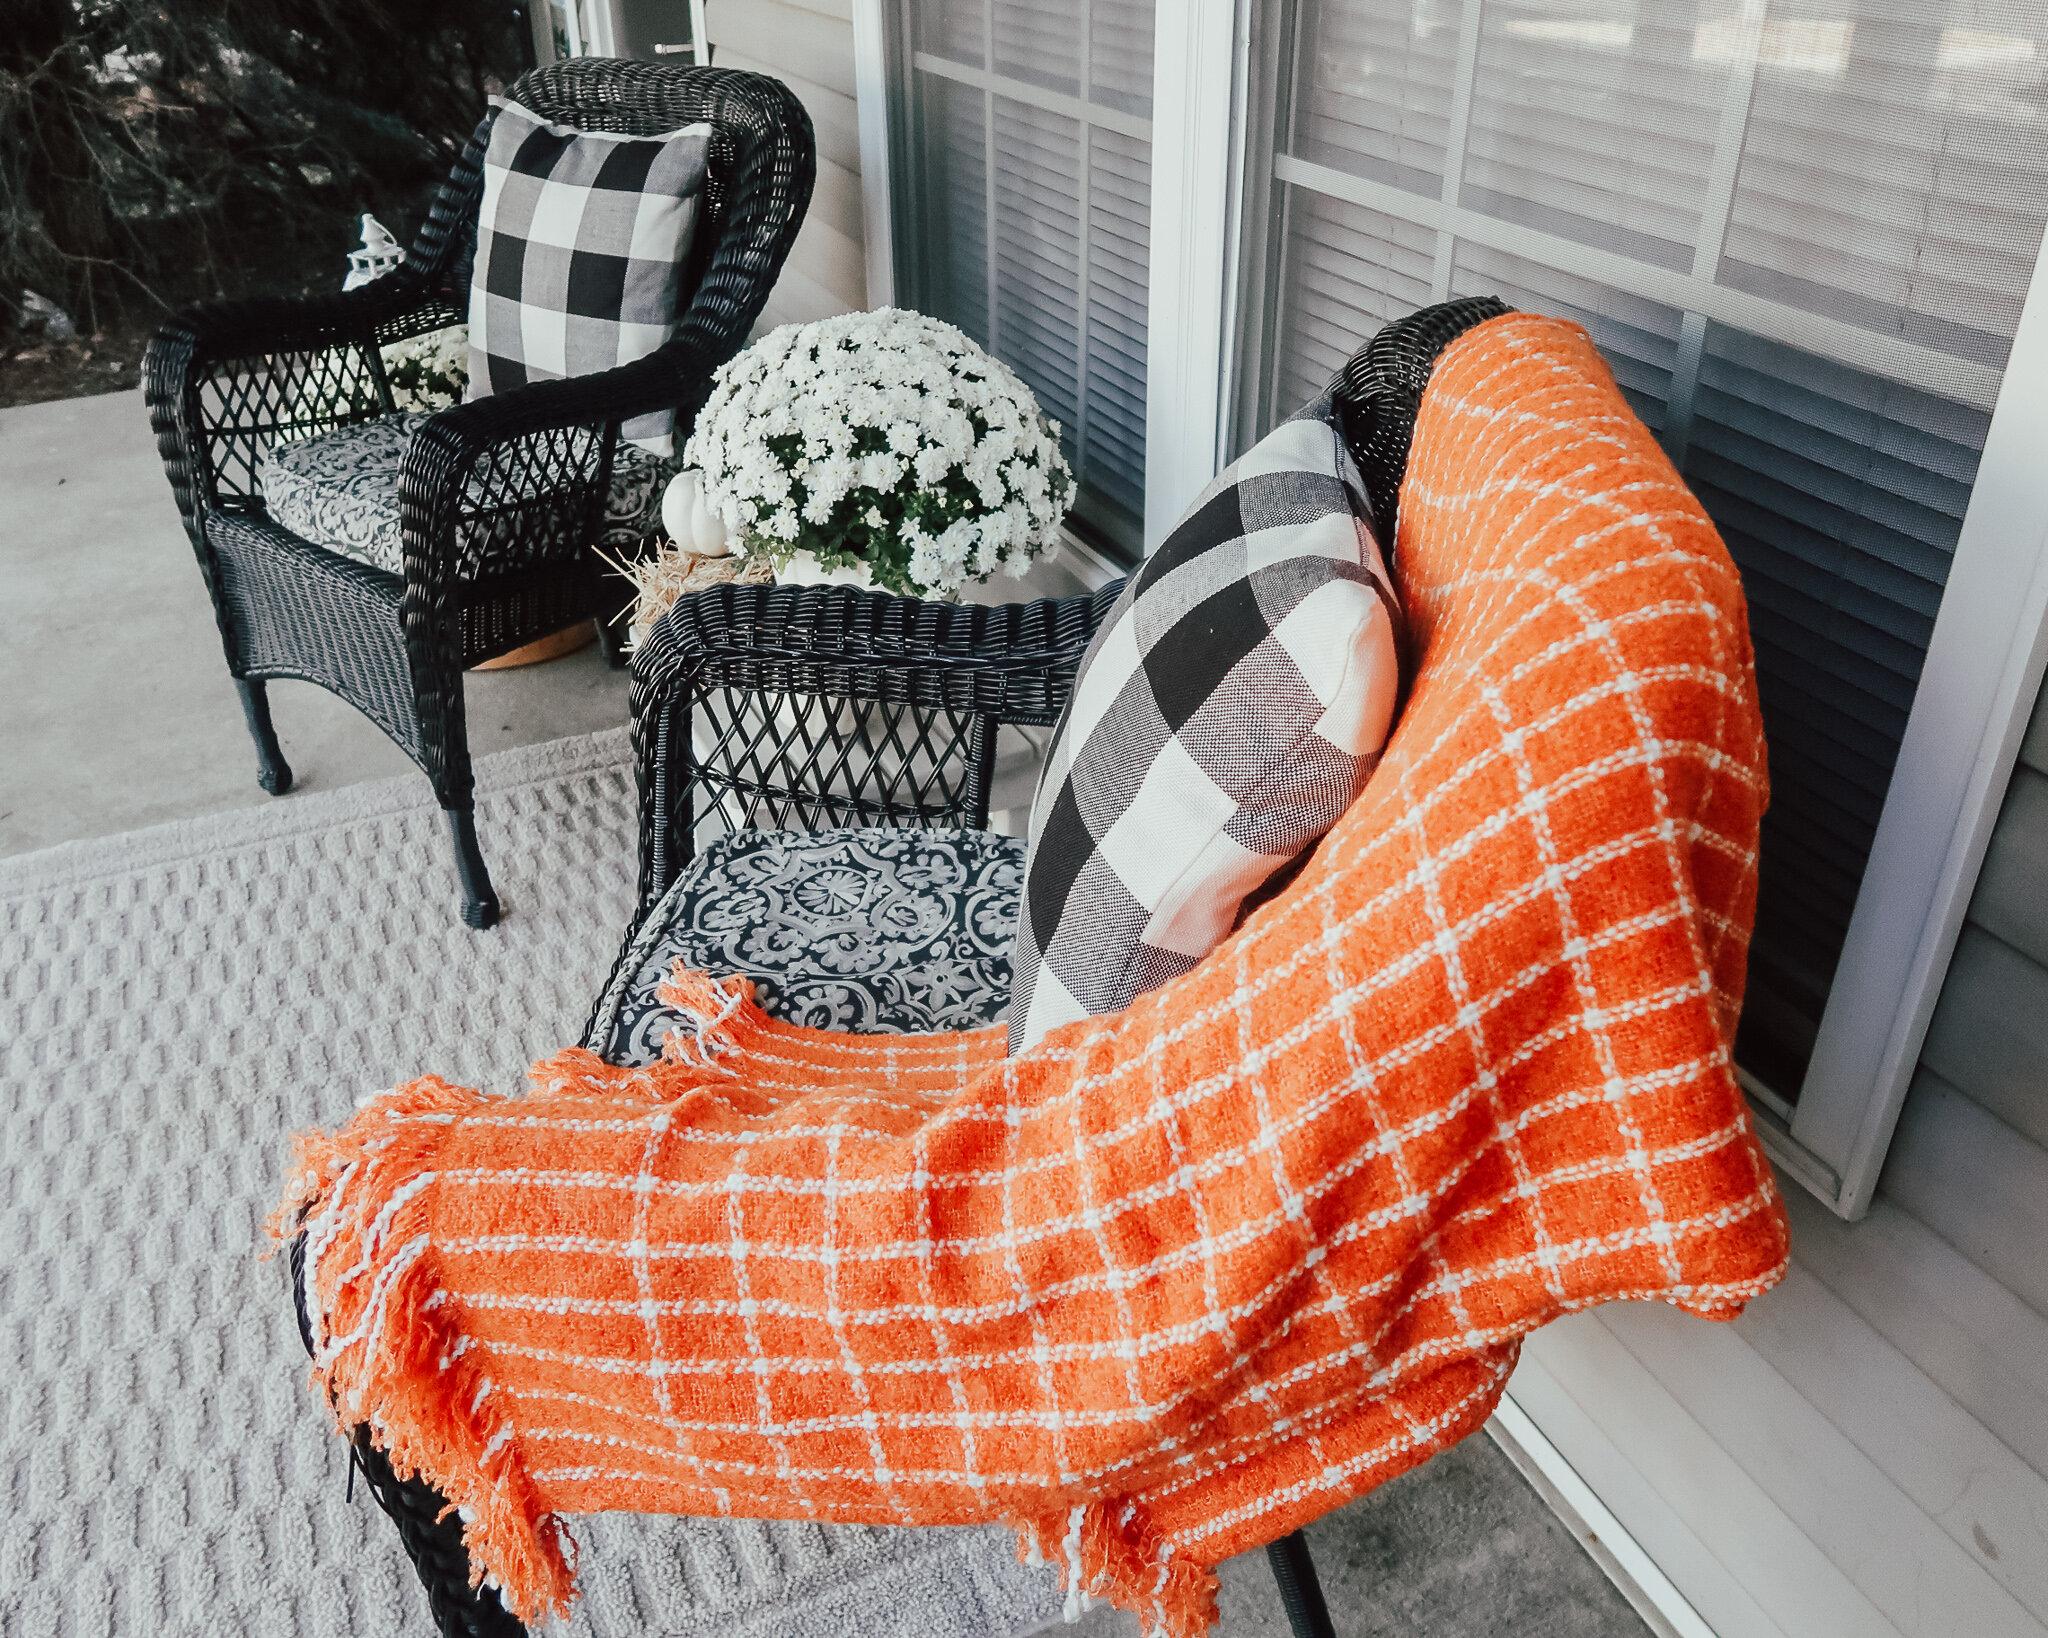 fall-front-porch-decor-16.jpg